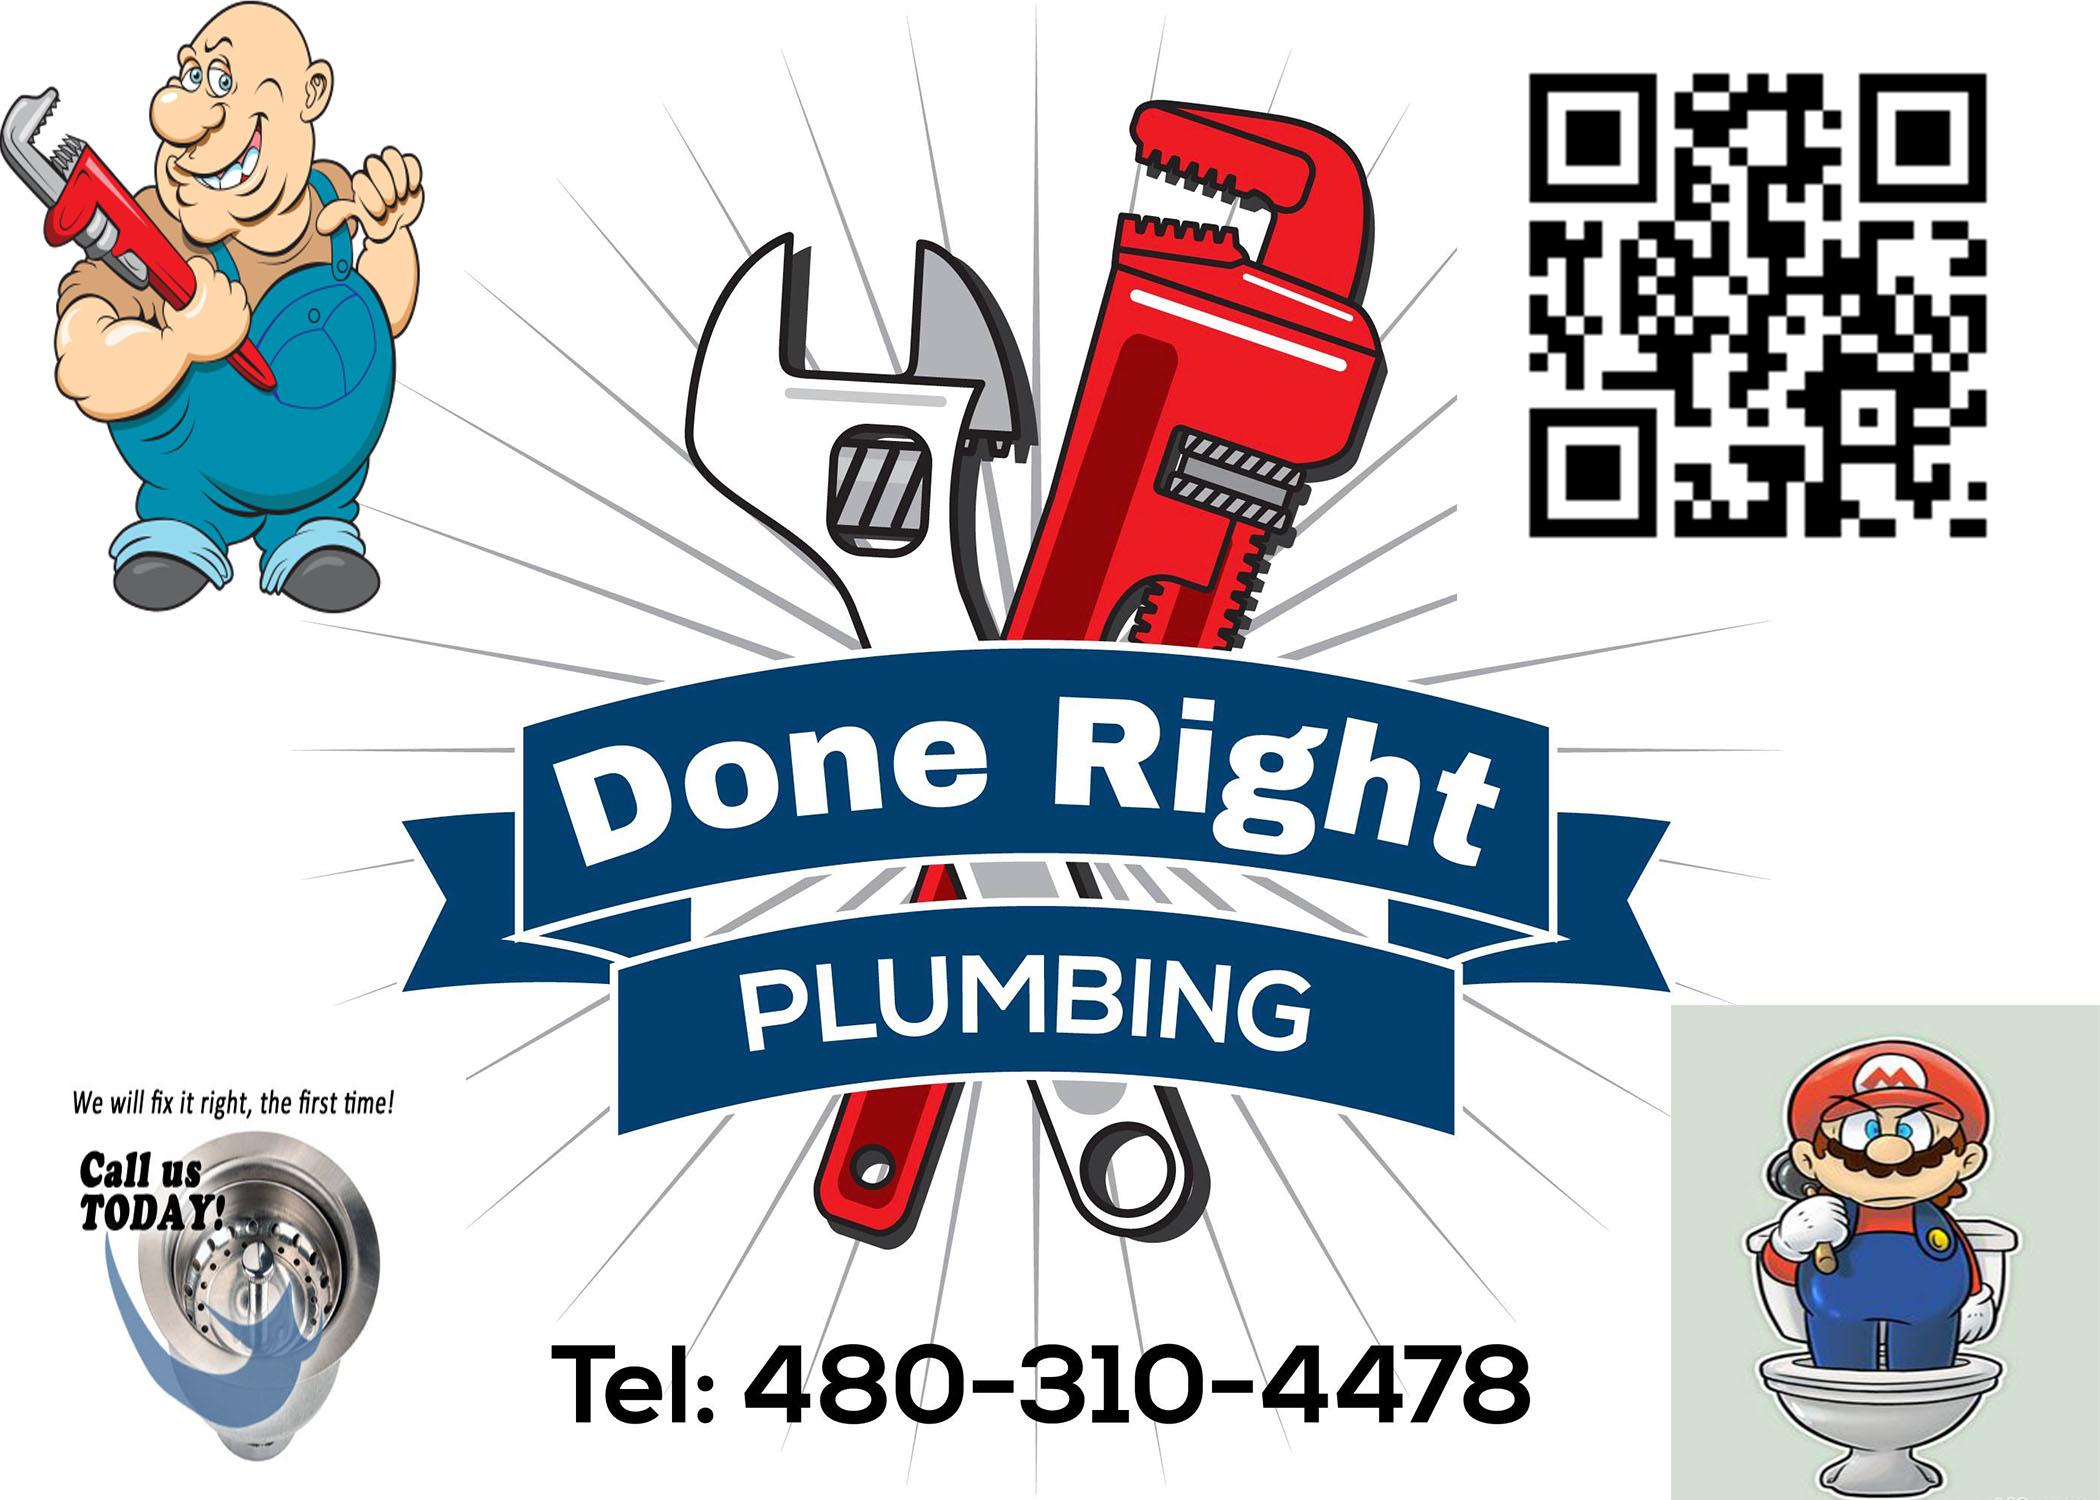 Done Right Plumbing In Mesa AZ 85210